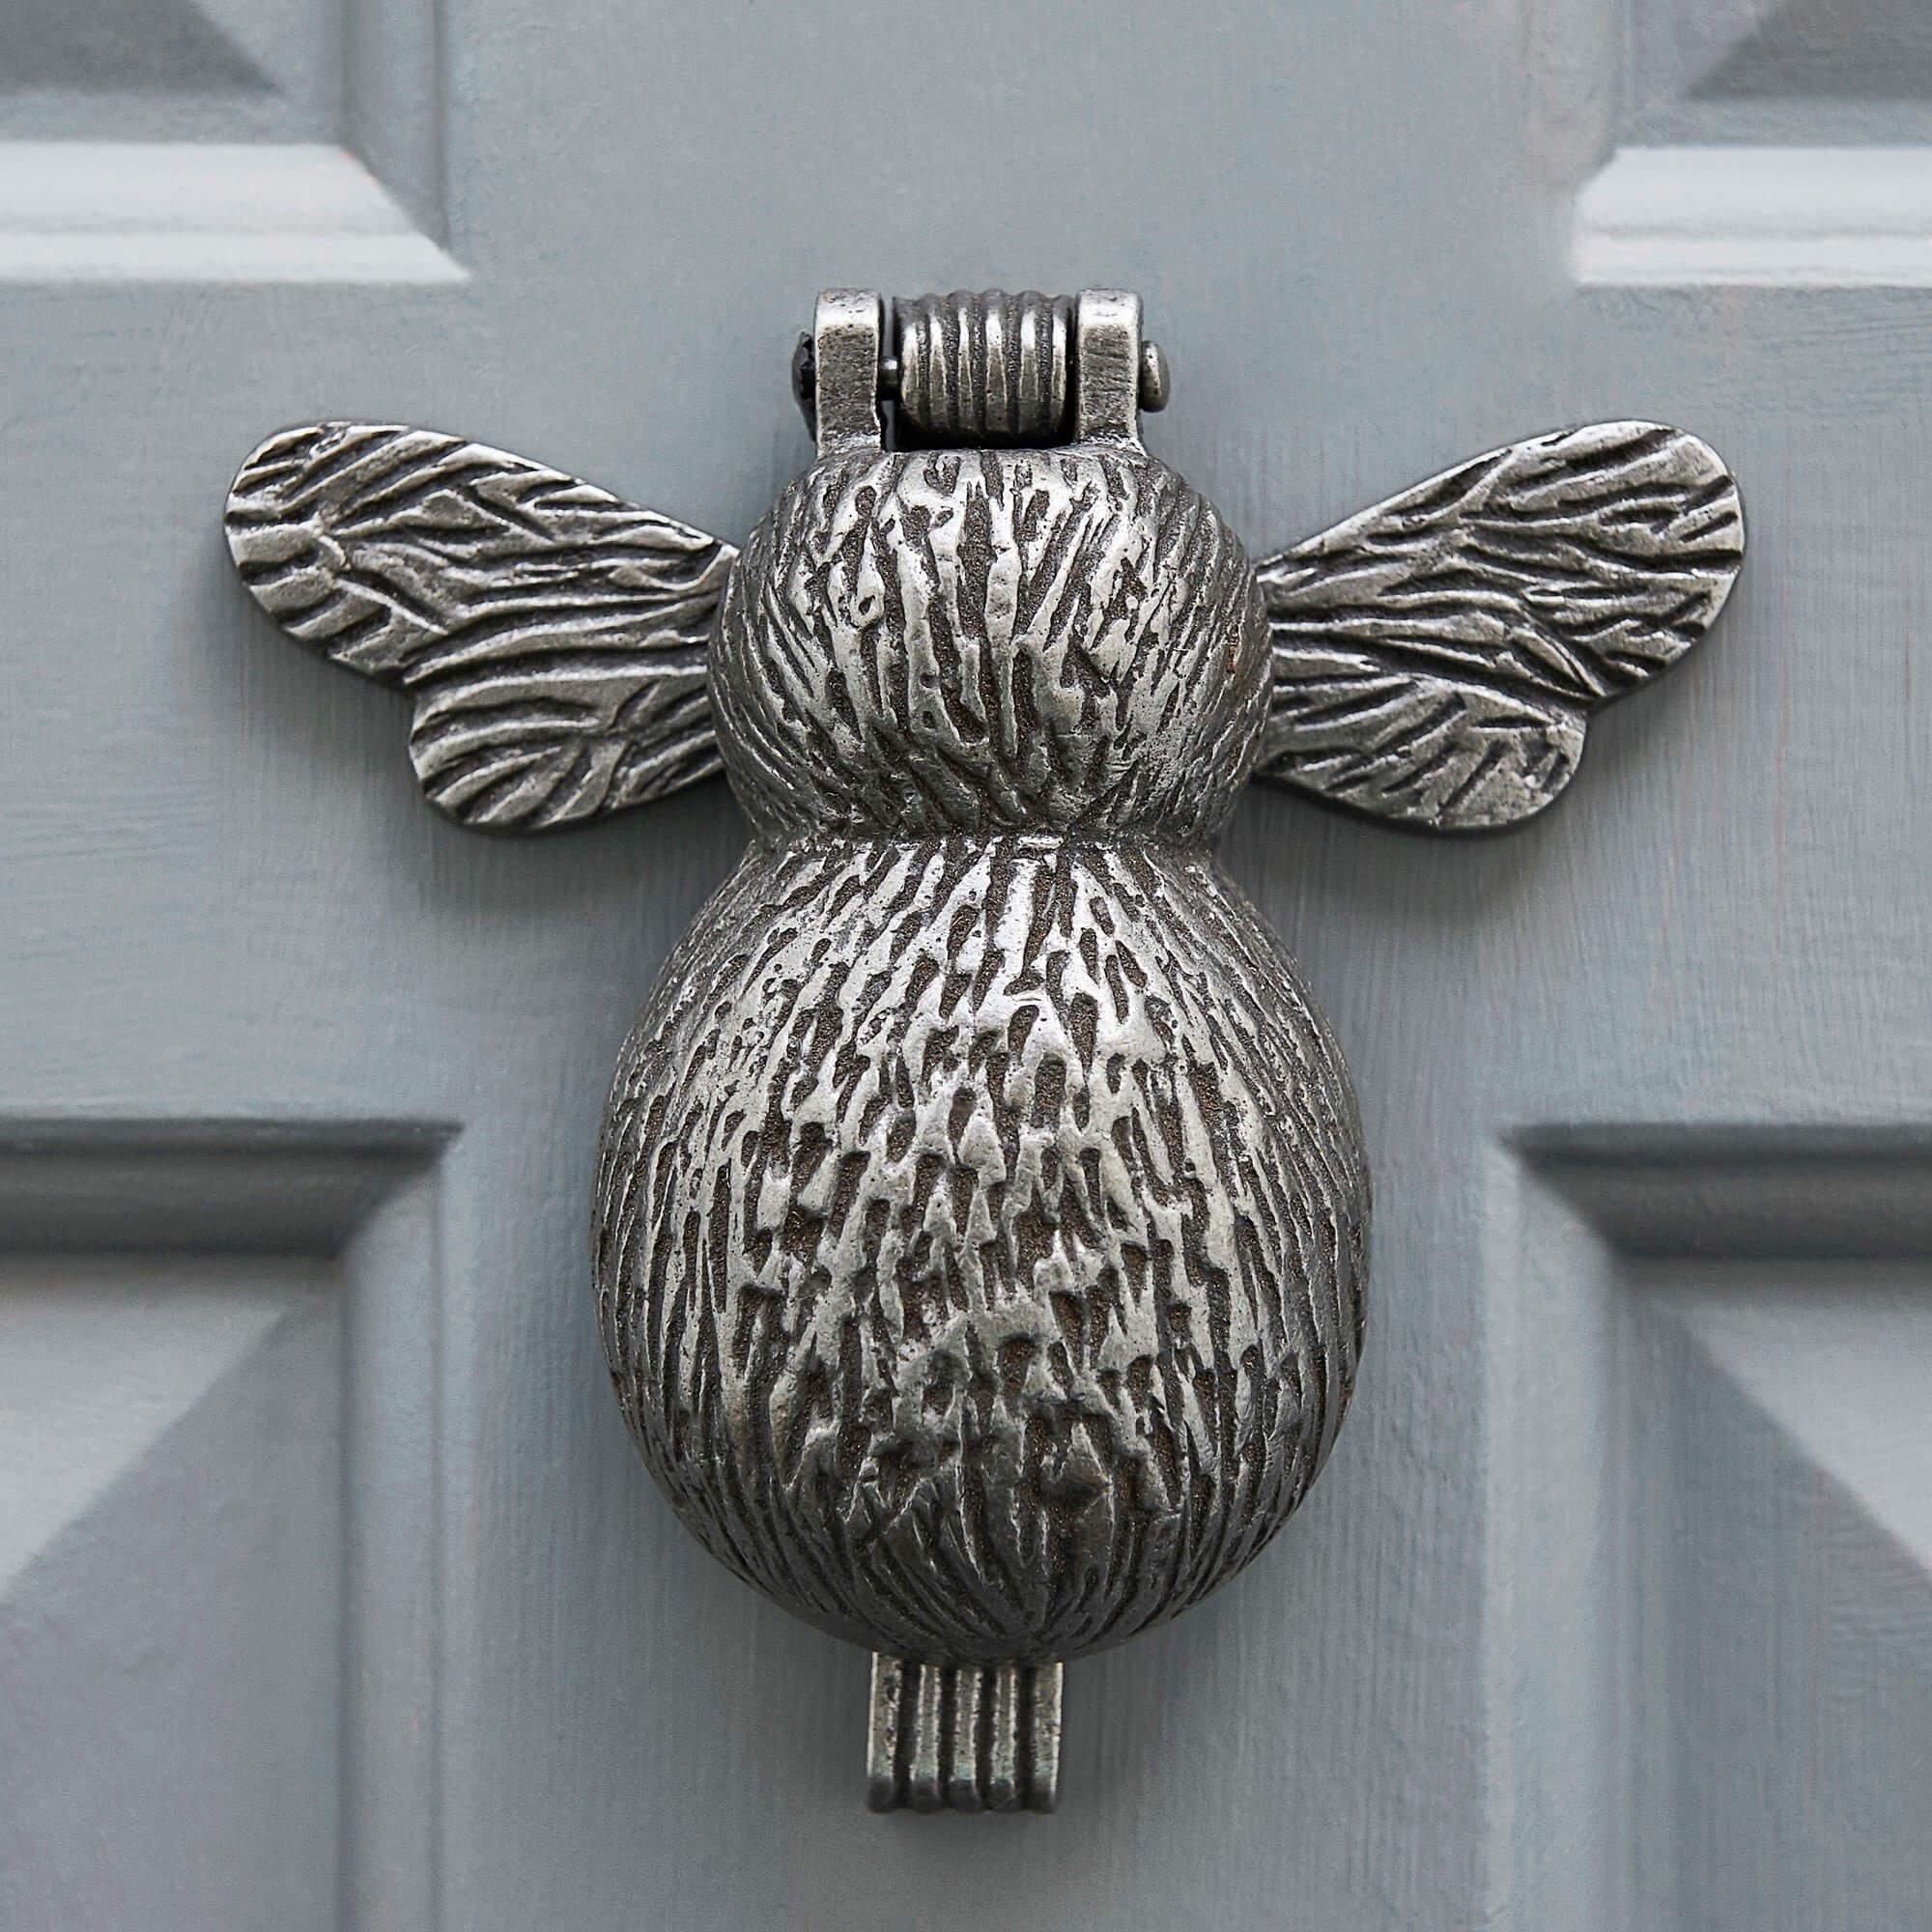 Bumble Bee Door Knocker - Antique Iron save 25%